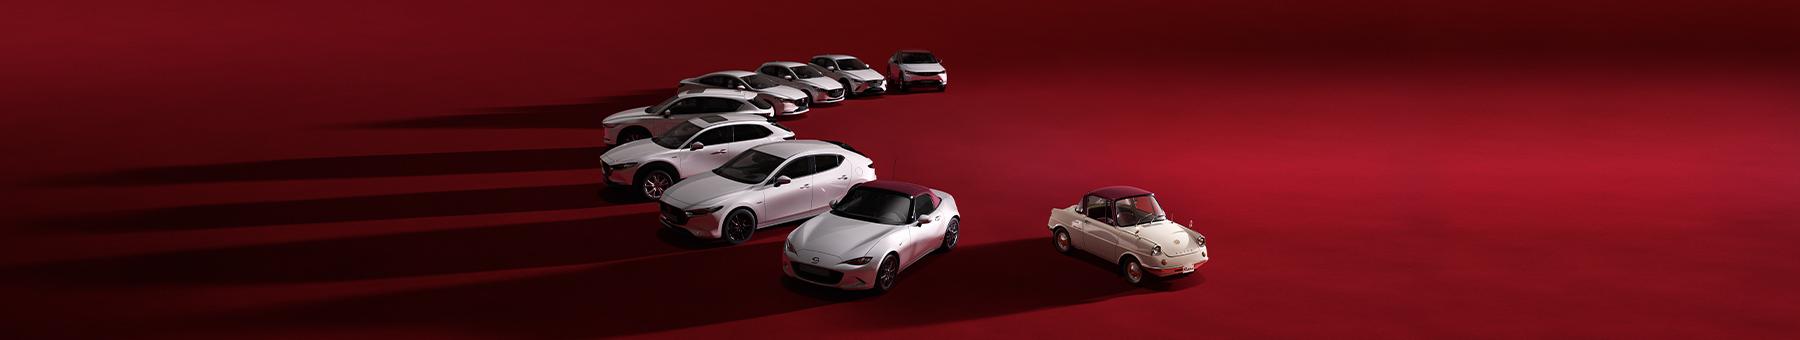 Edícia Mazda 100th Anniversary